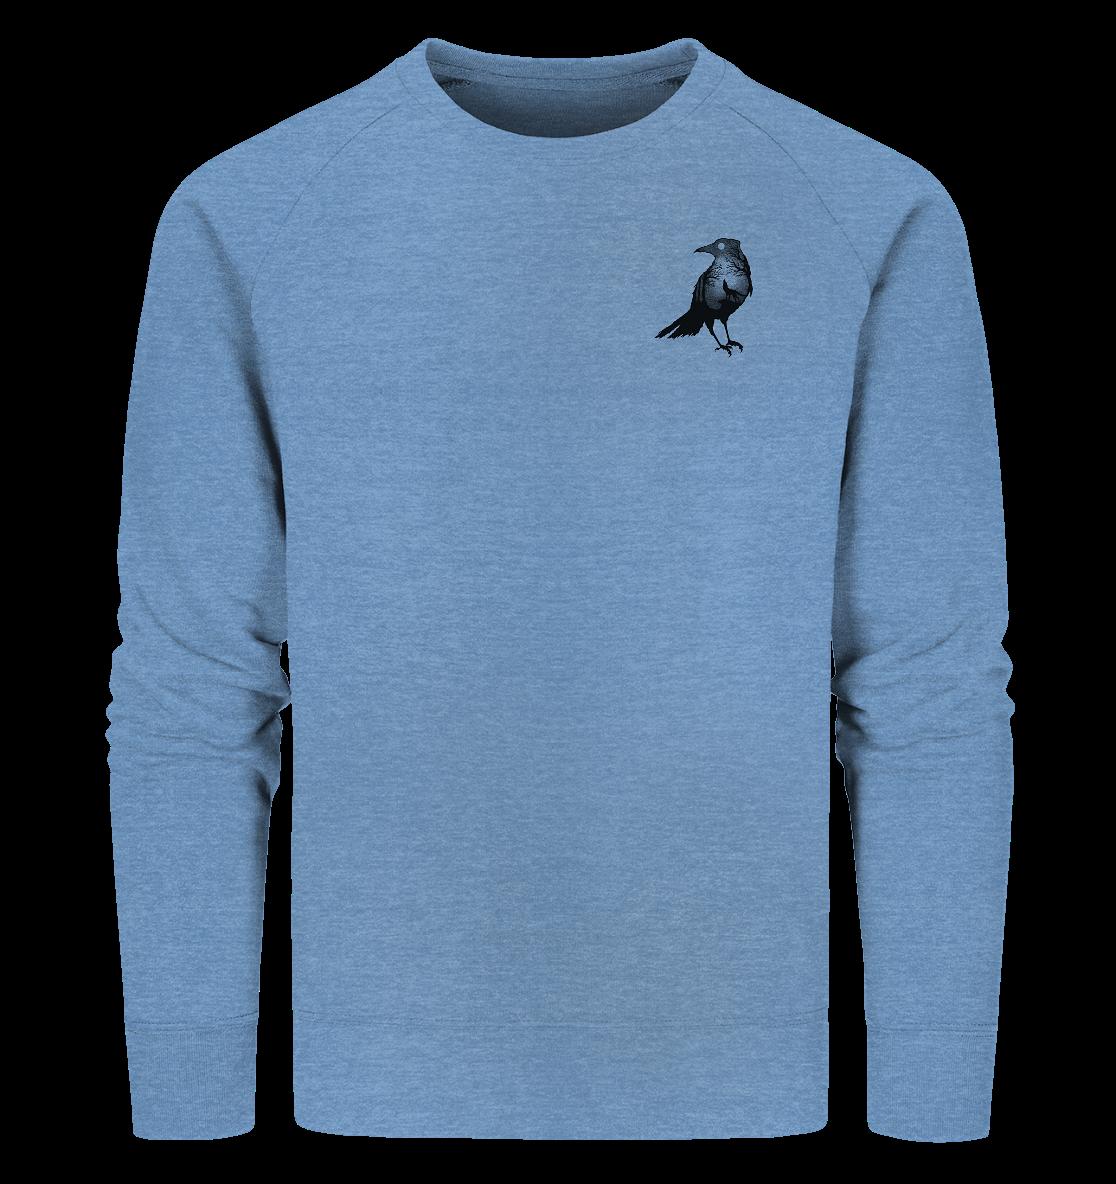 front-organic-sweatshirt-6090c4-1116x-3.png